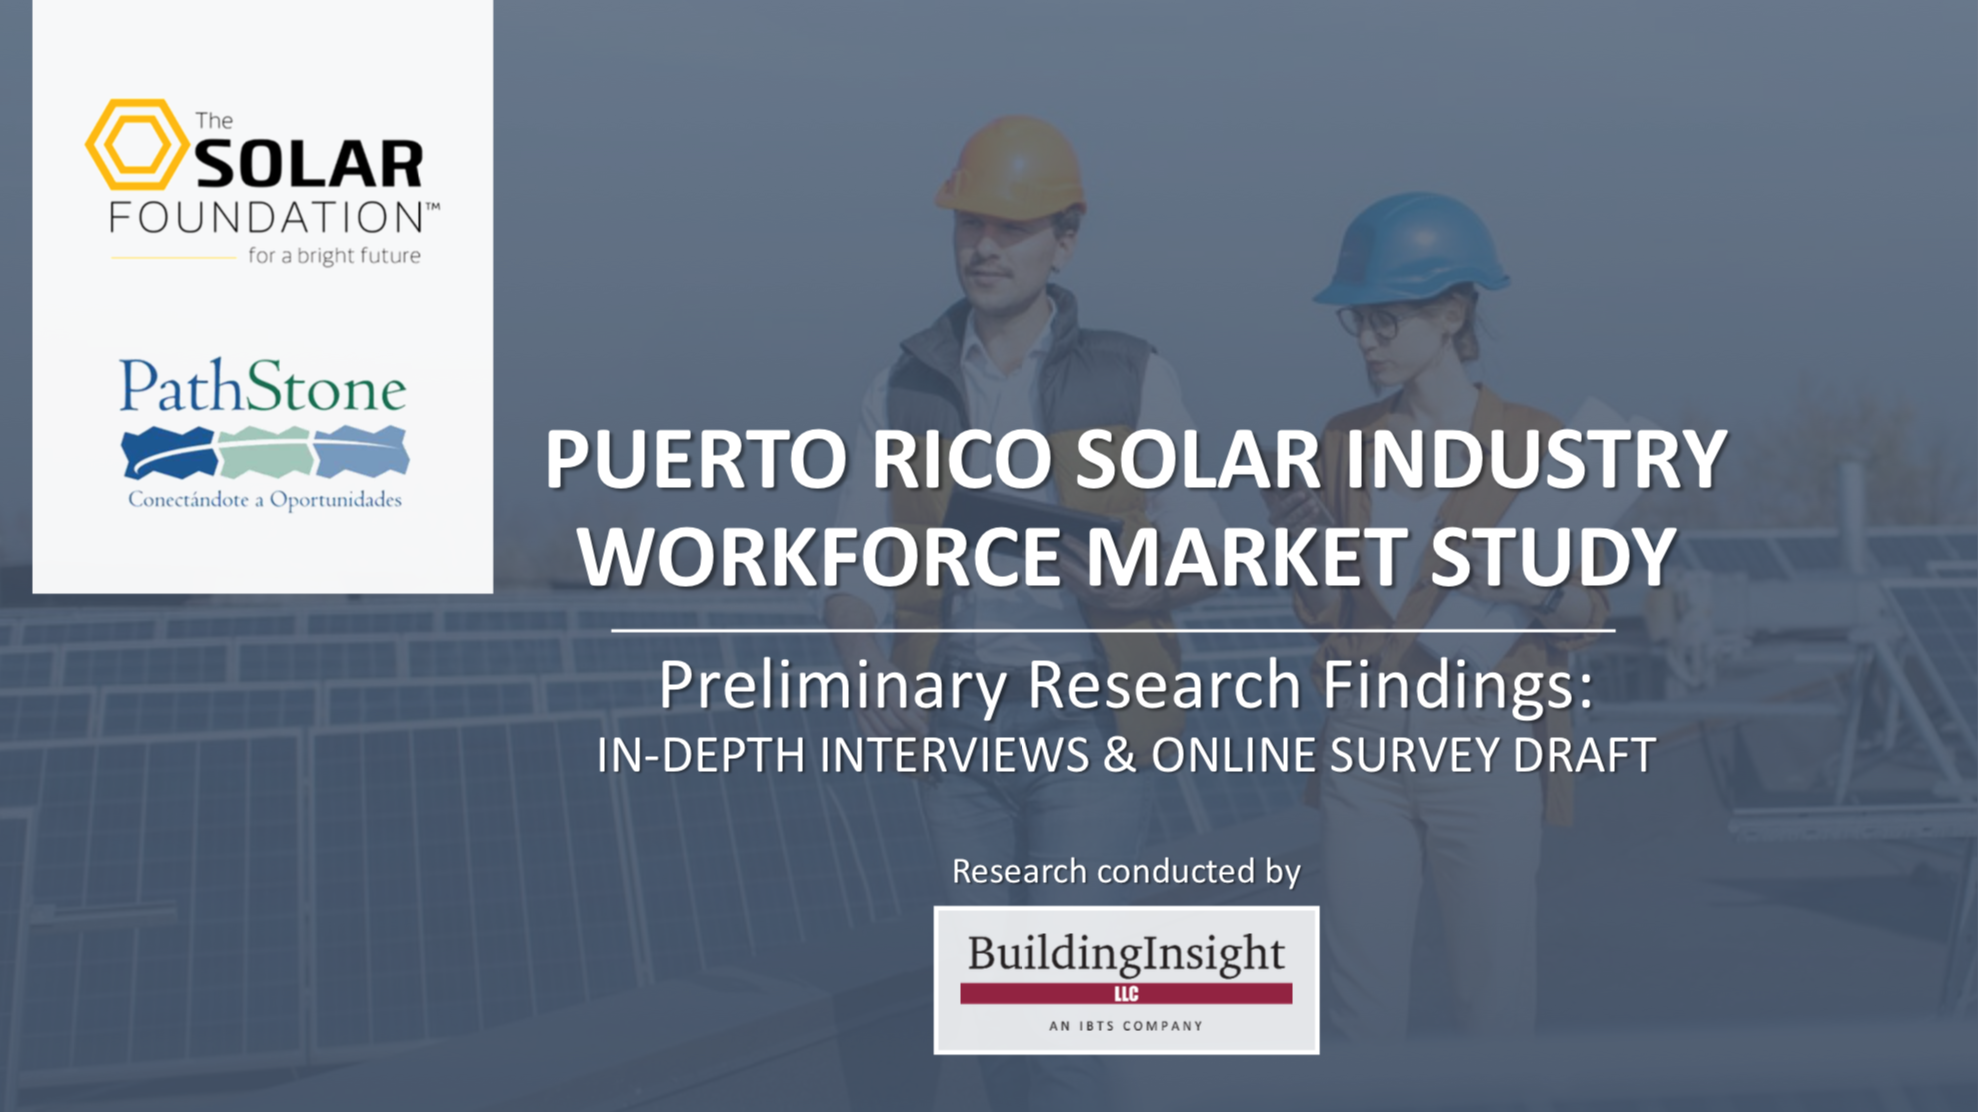 Puerto Rico Solar Industry Workforce Market Study